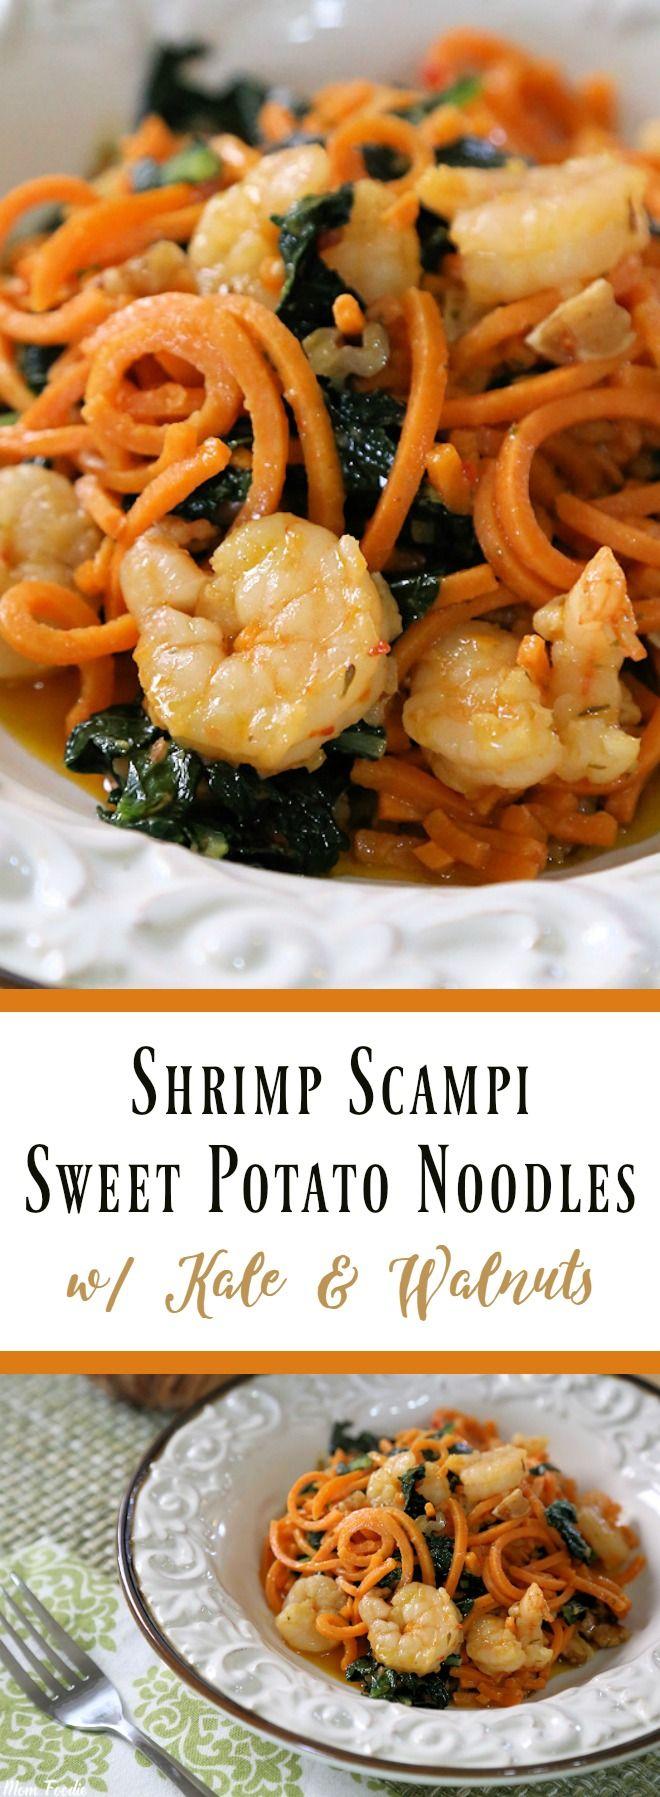 Shrimp Scampi Sweet Potato Noodles with Kale & Walnuts #ad